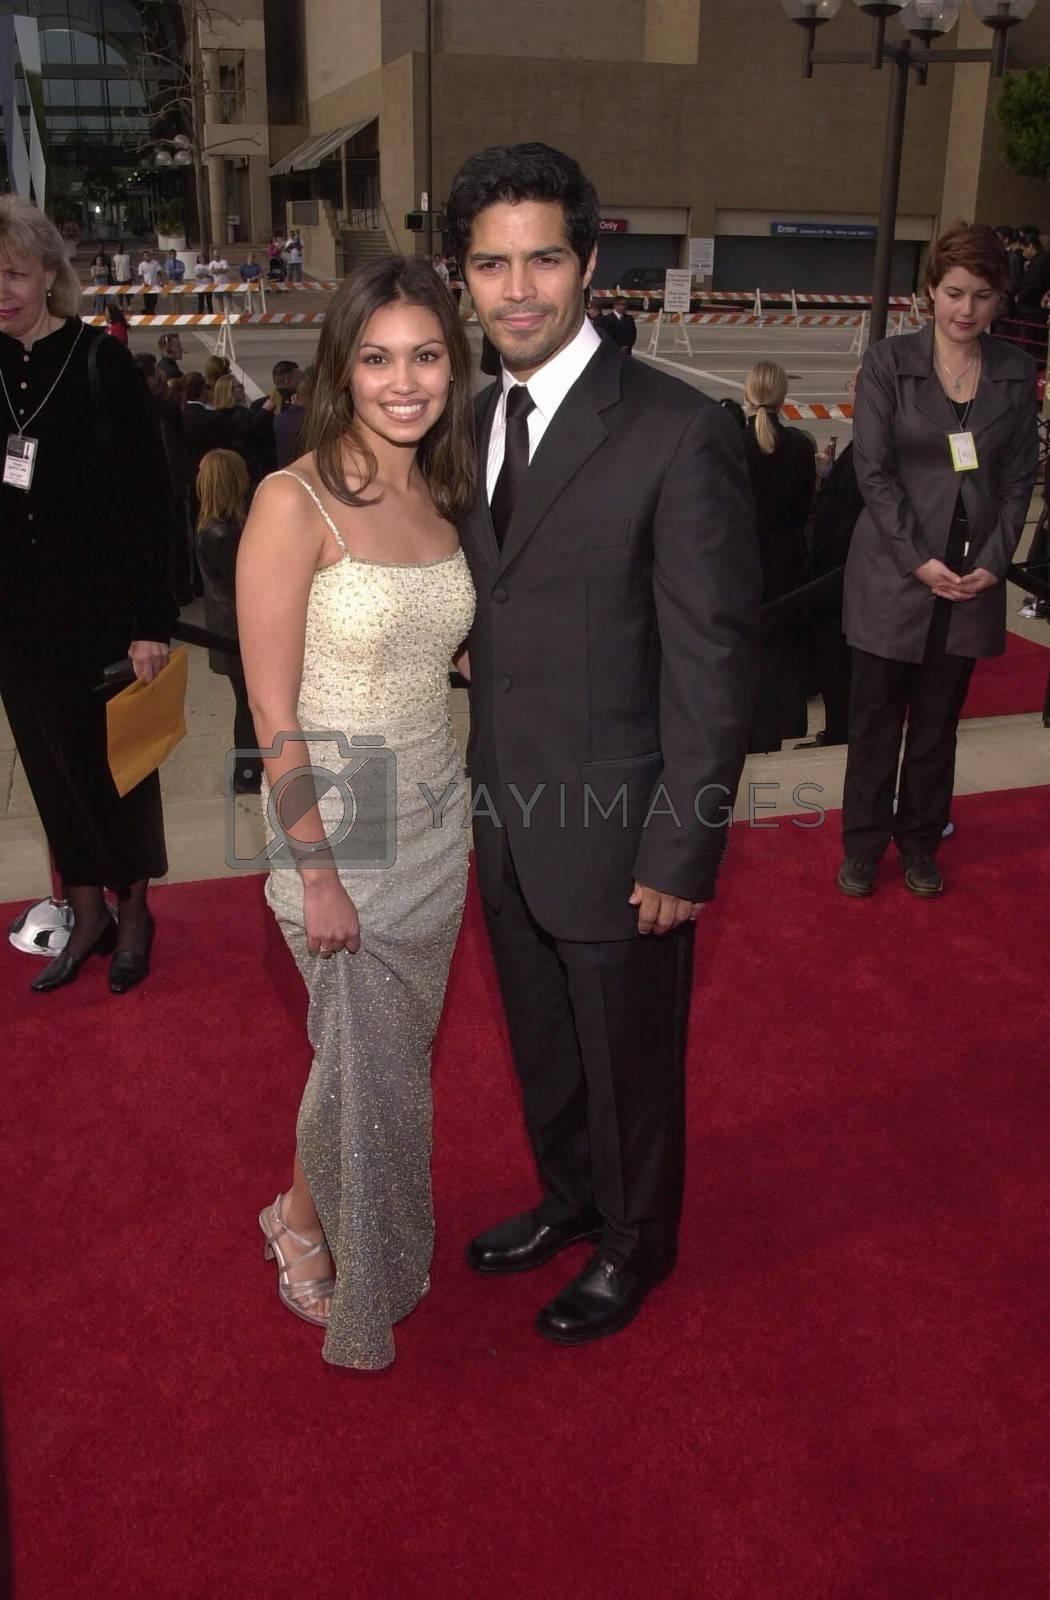 Esai Morales and date at the 2000 Alma Awards, in Pasadena, 04-16-00